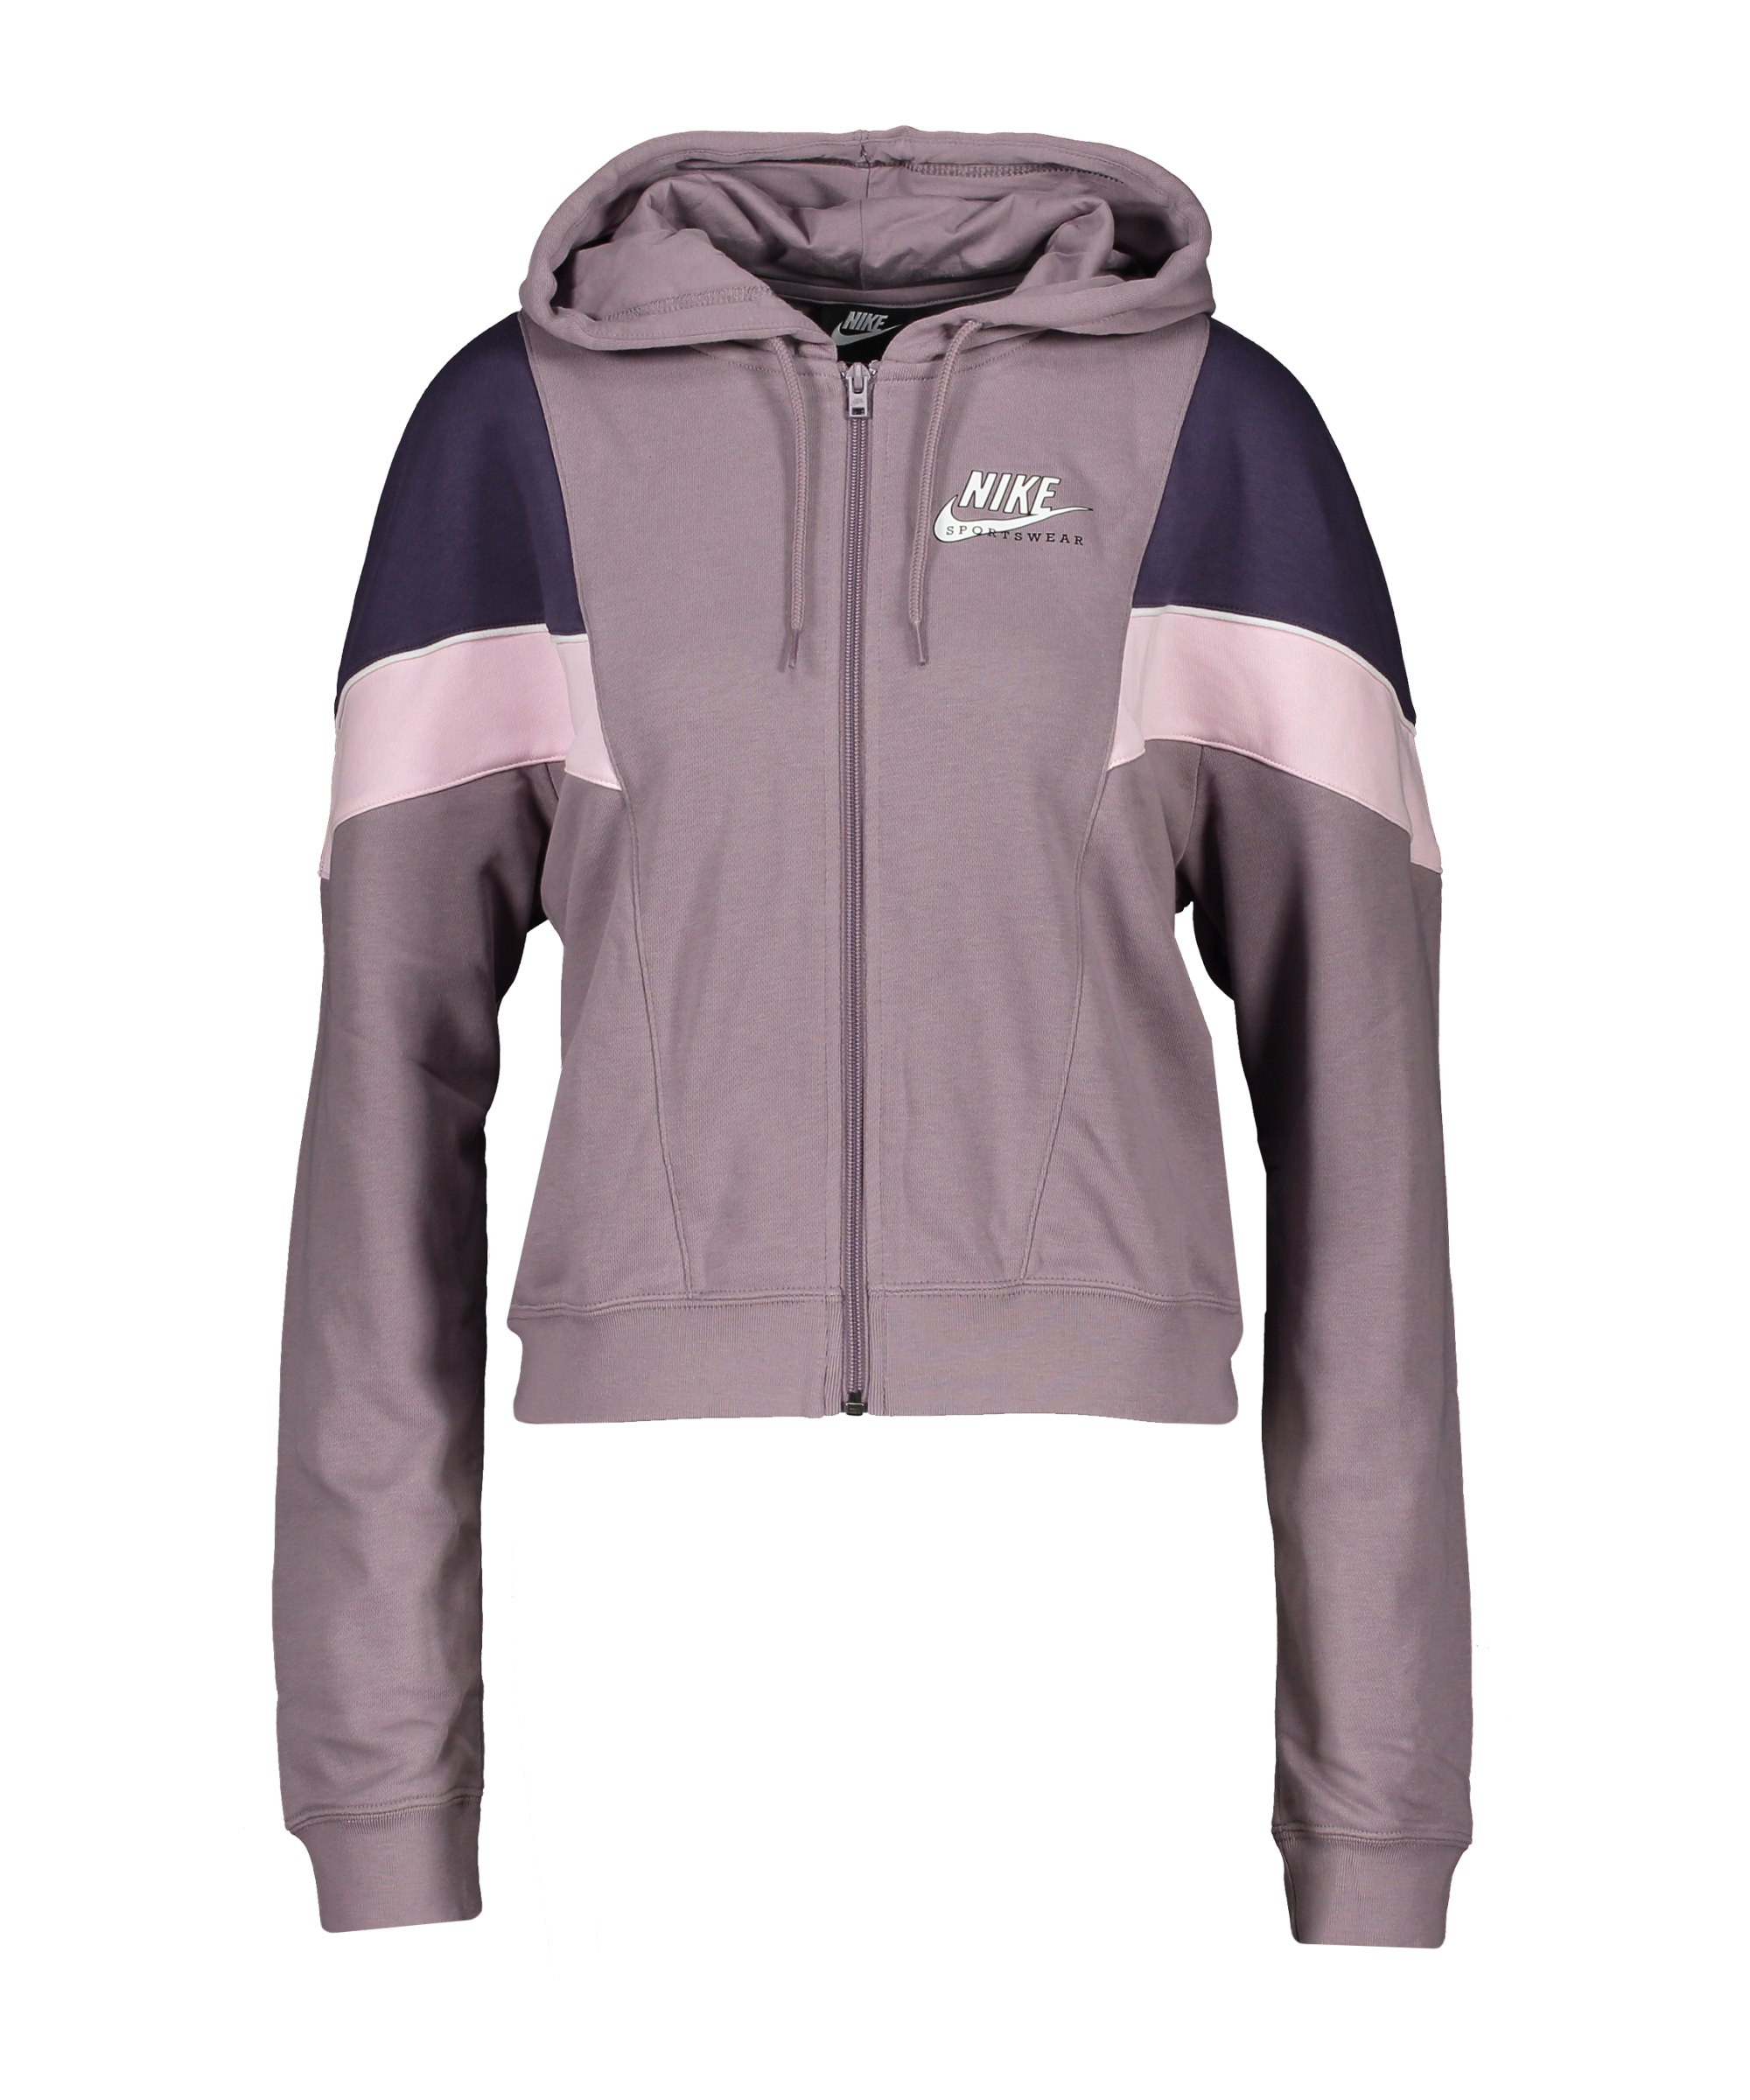 Nike Heritage Kapuzenjacke Damen Lila Weiss F531 - lila